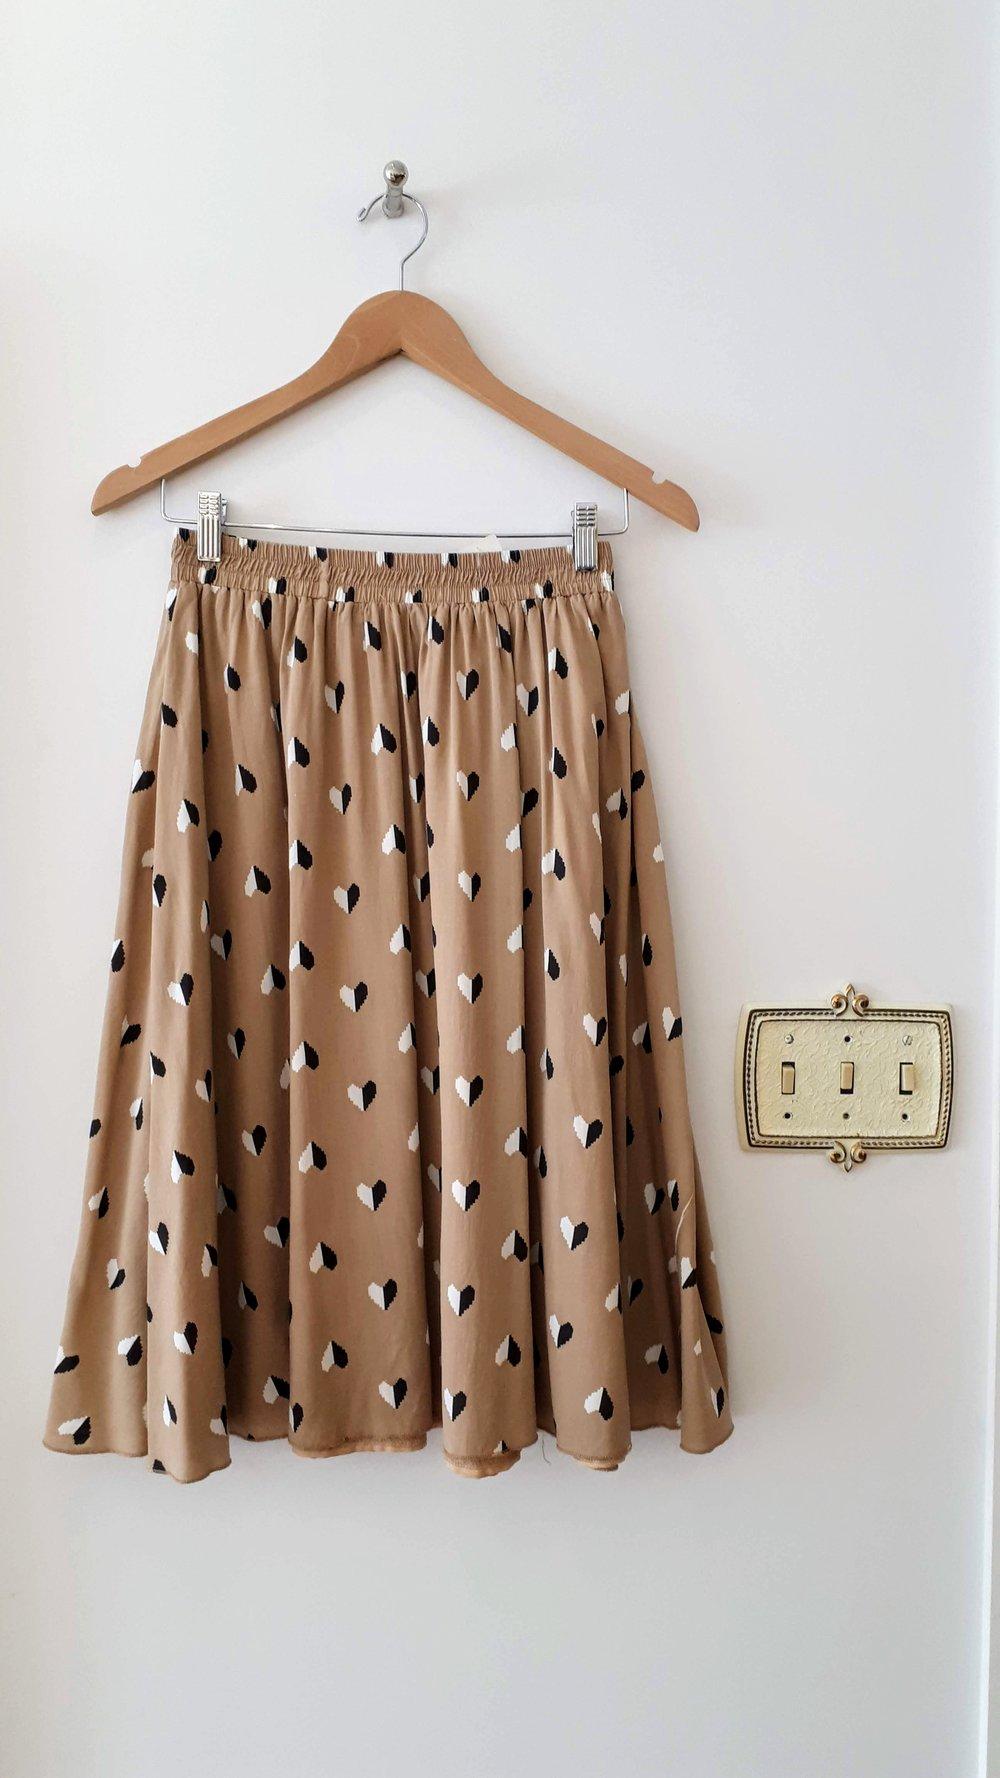 Compania Fantastica skirt; Size M, $26